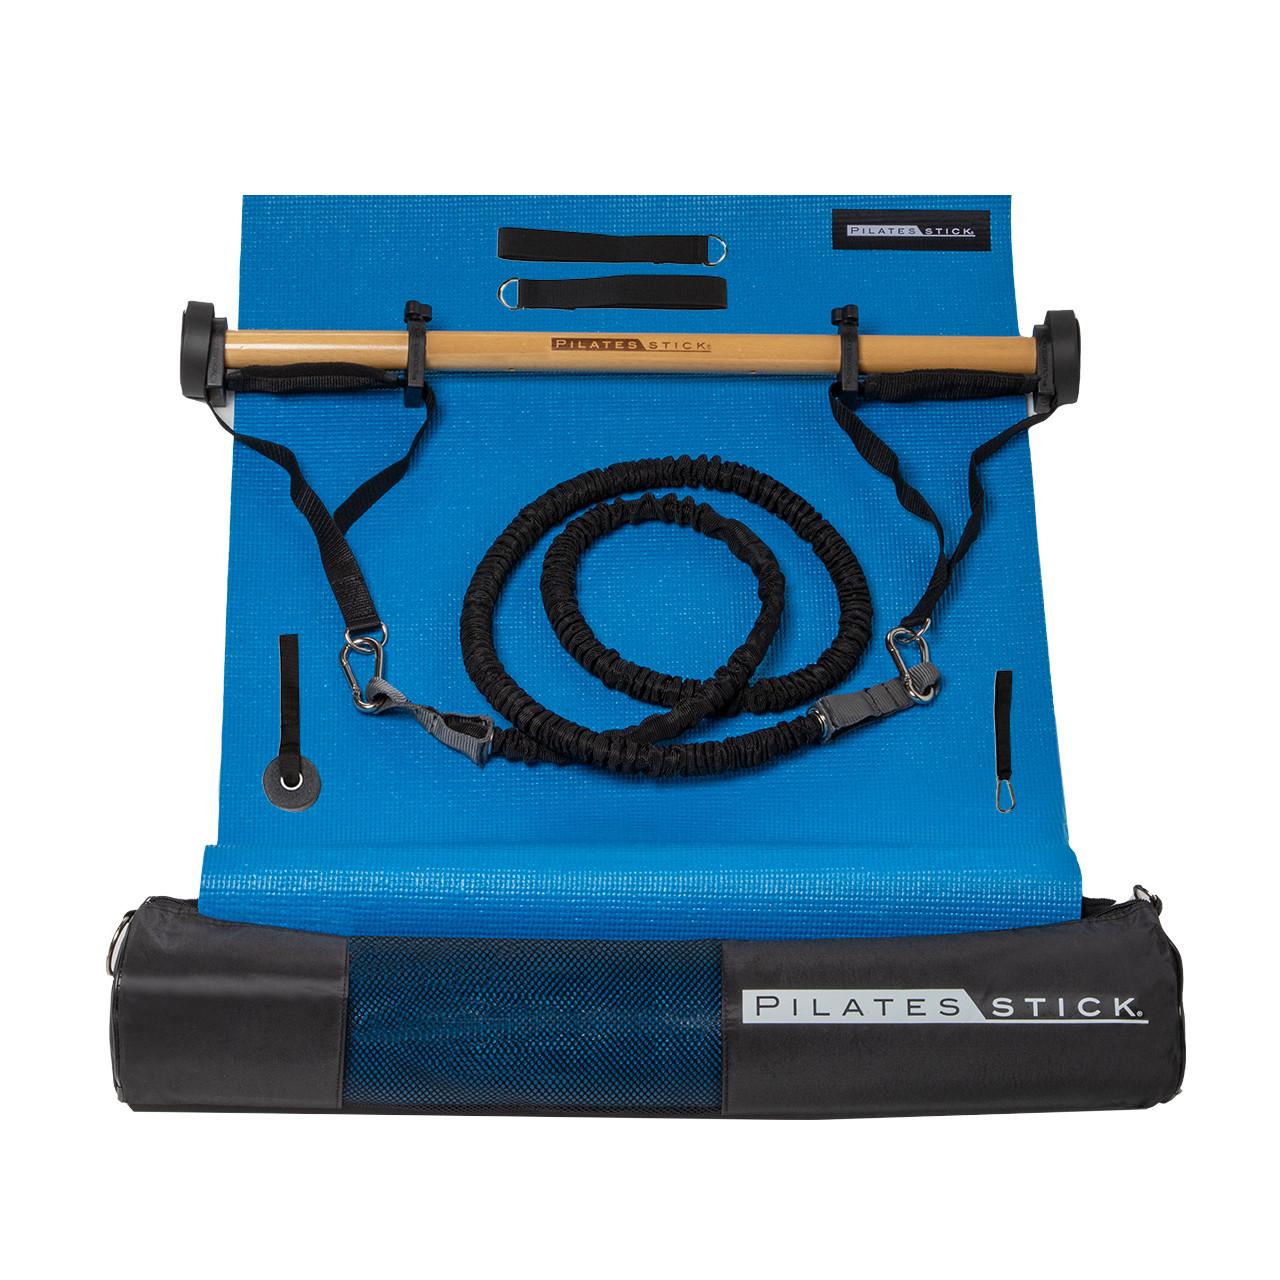 Pilatesstick® Basic Kit Package - Refurbished